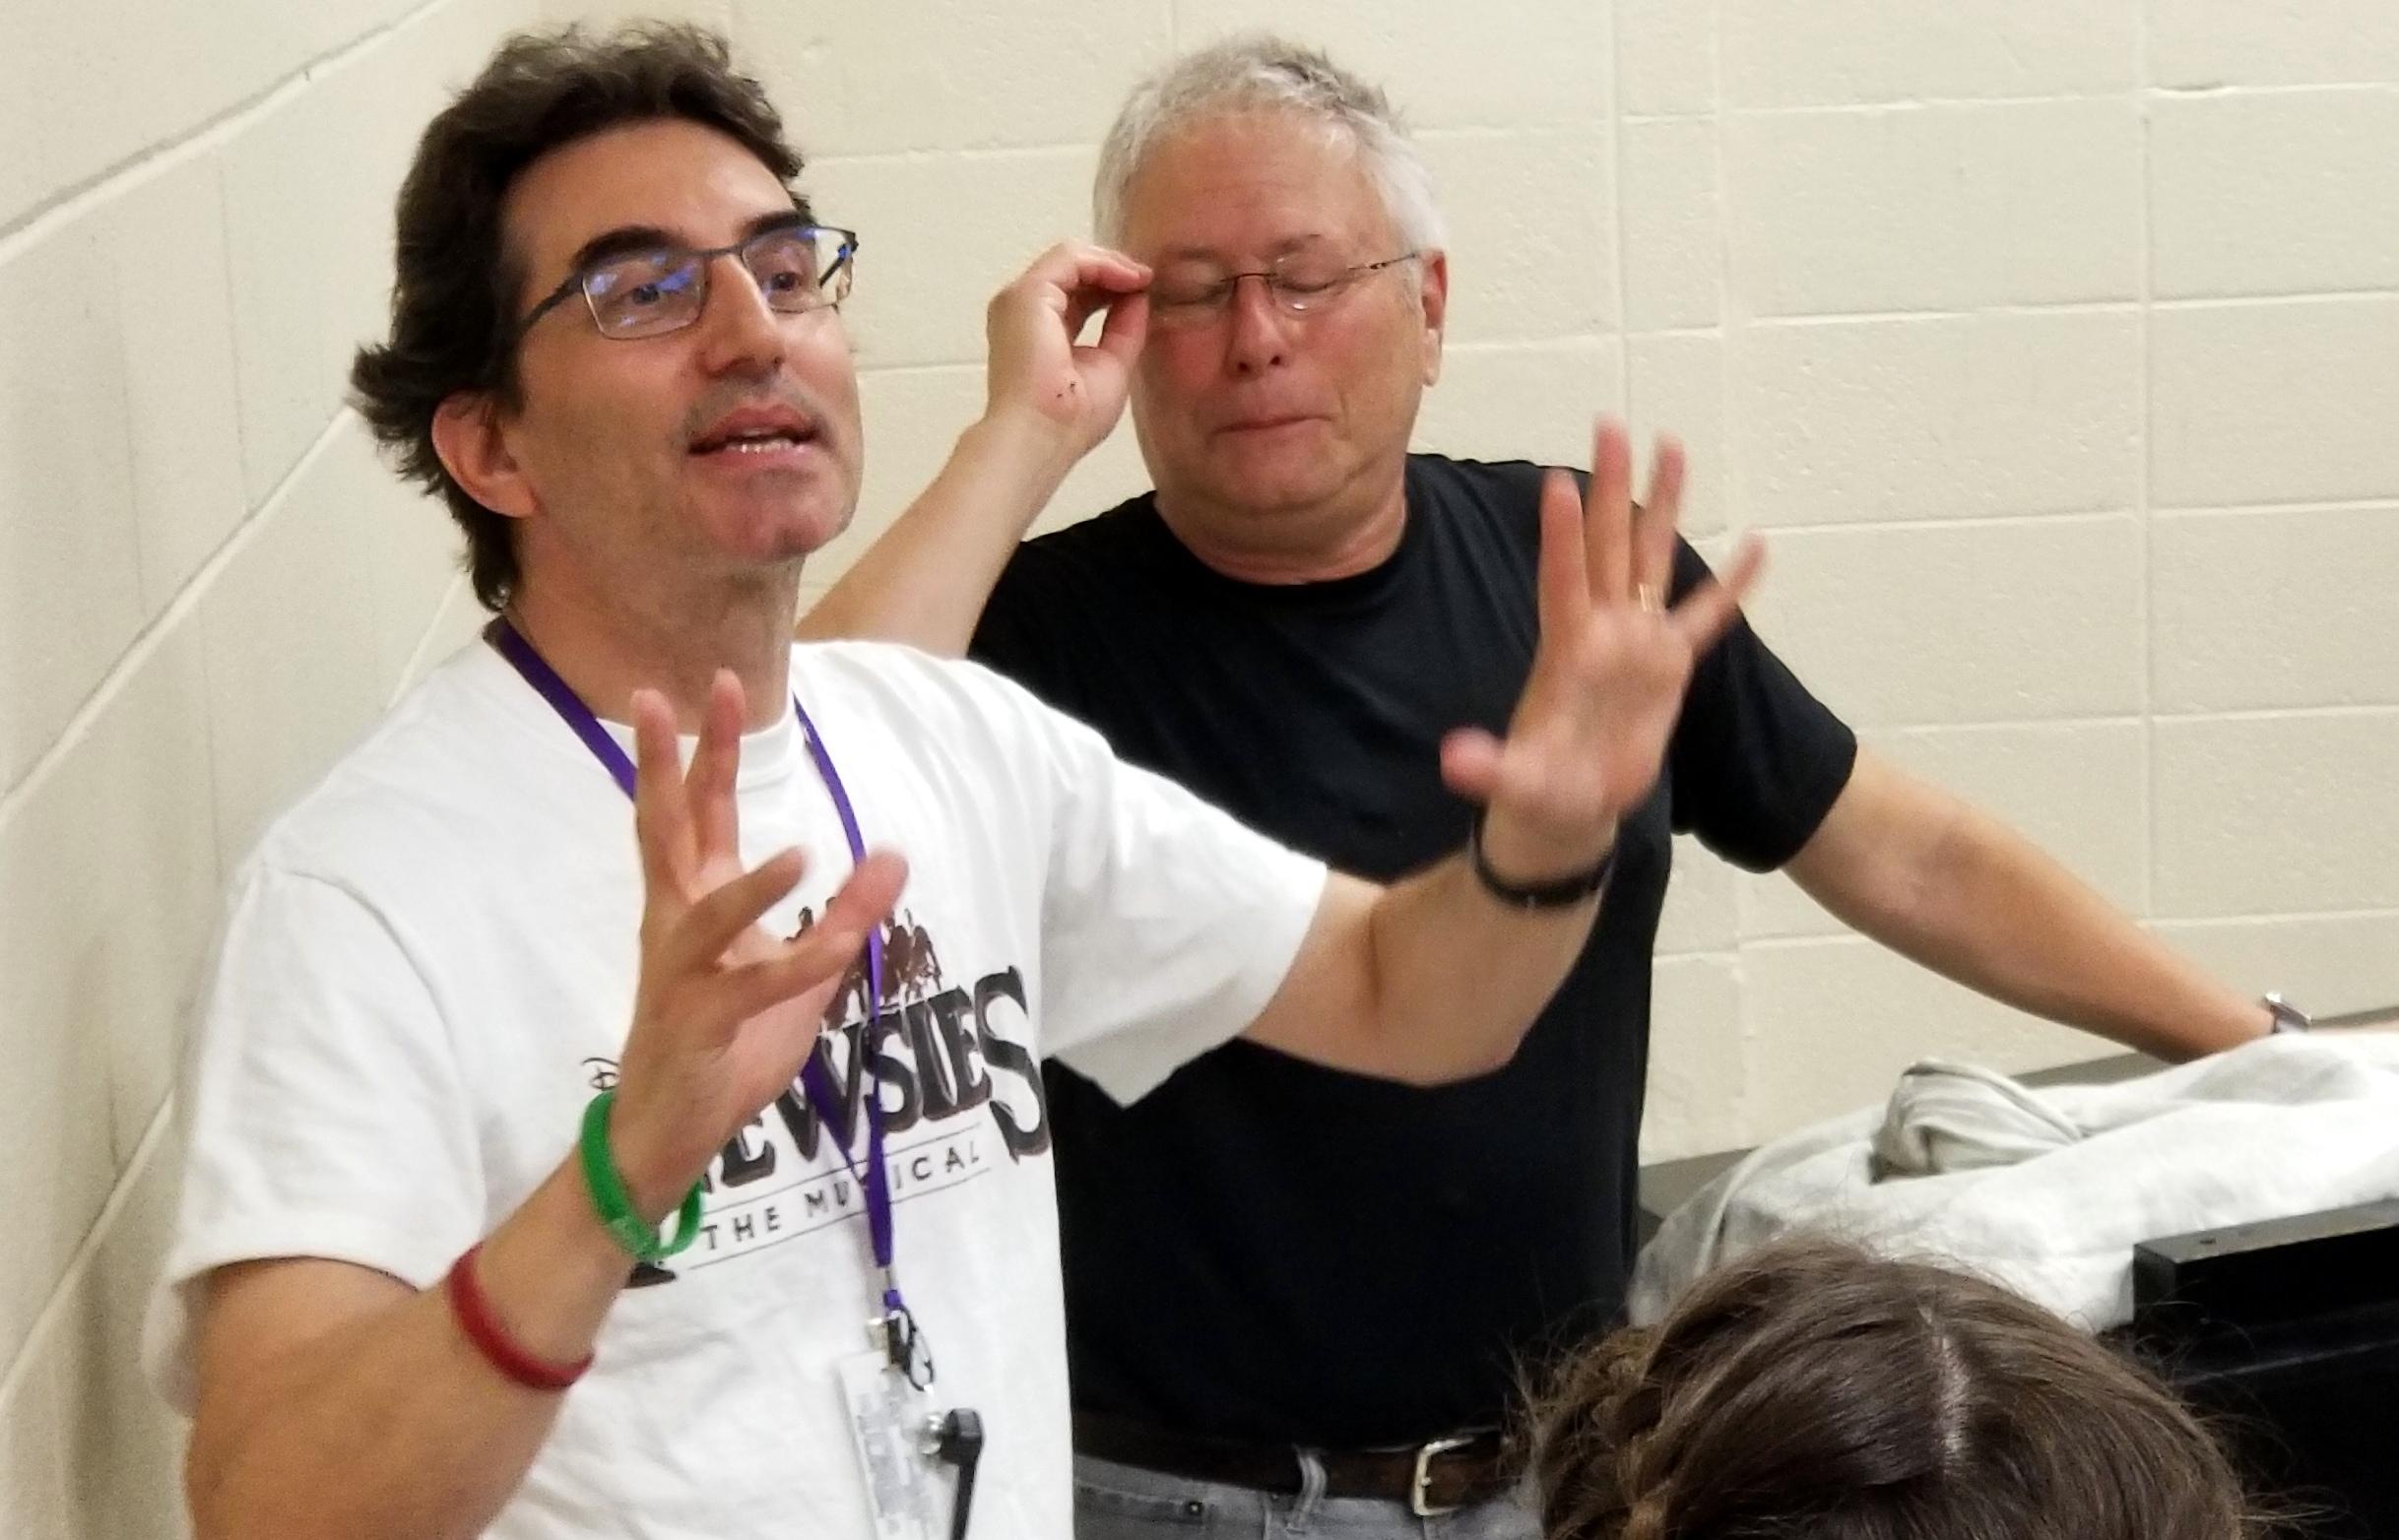 Newsies' Composer Alan Menken Drops In On NewArts Cast   The Newtown Bee